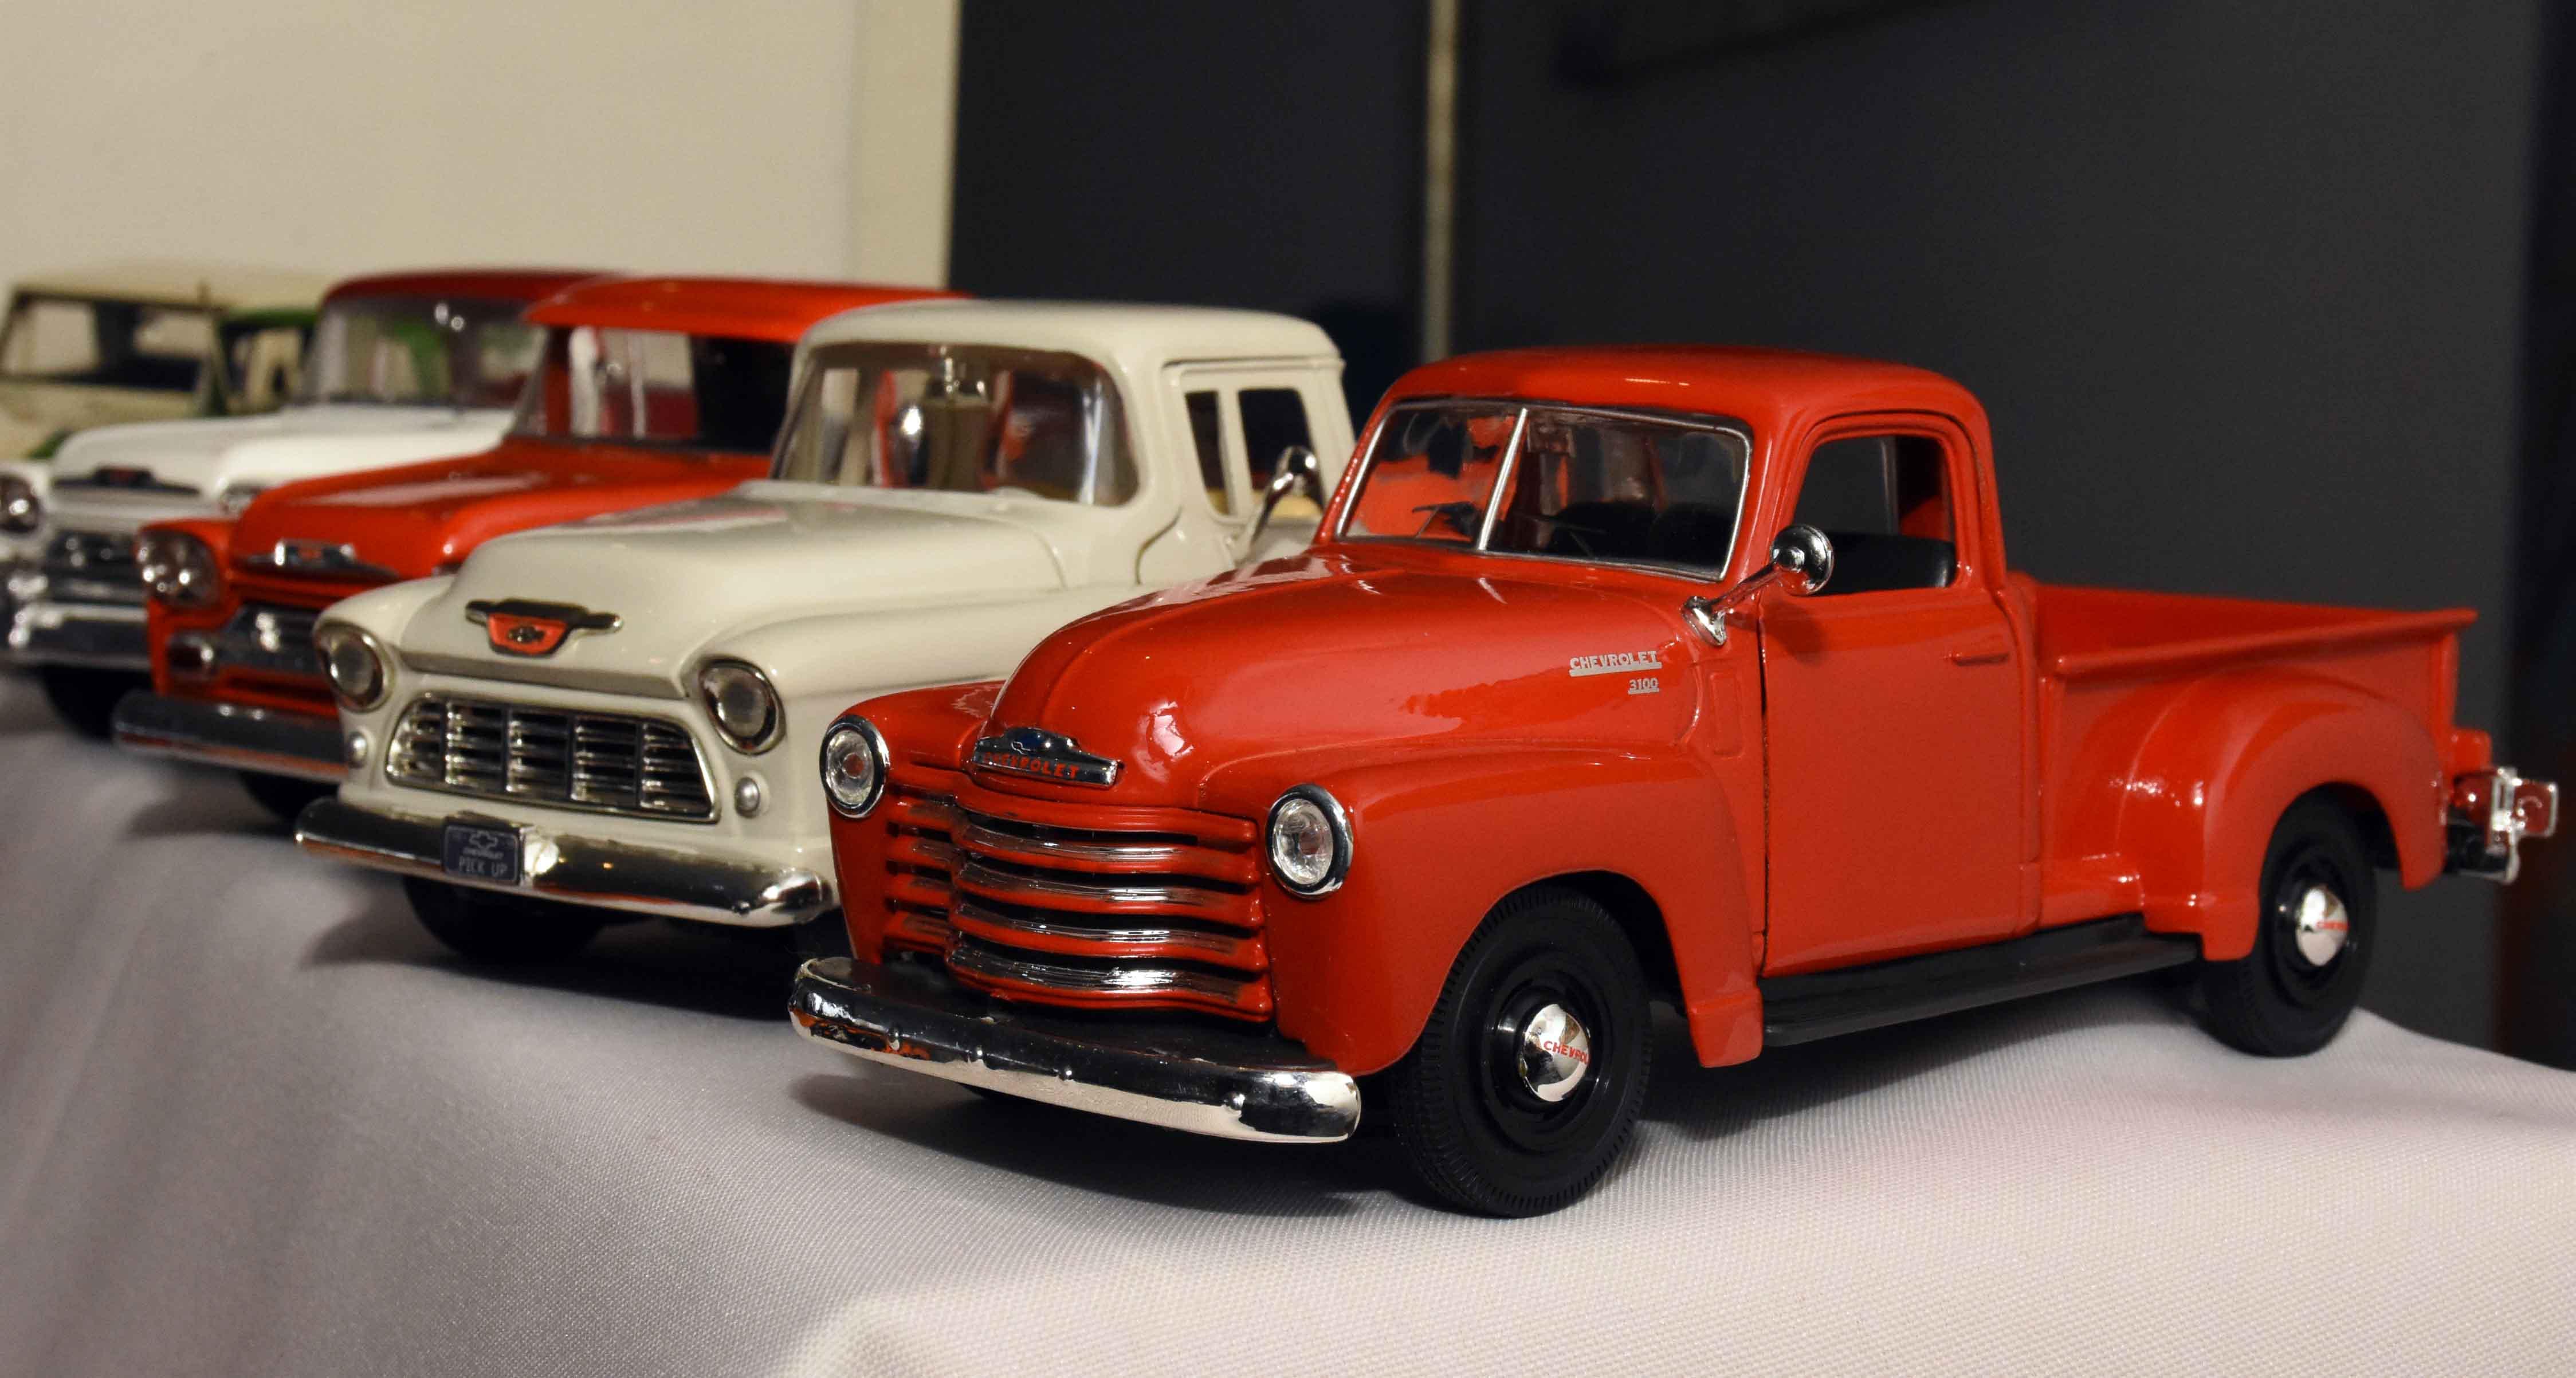 Exposición de autos a escala en La Barraca (2)